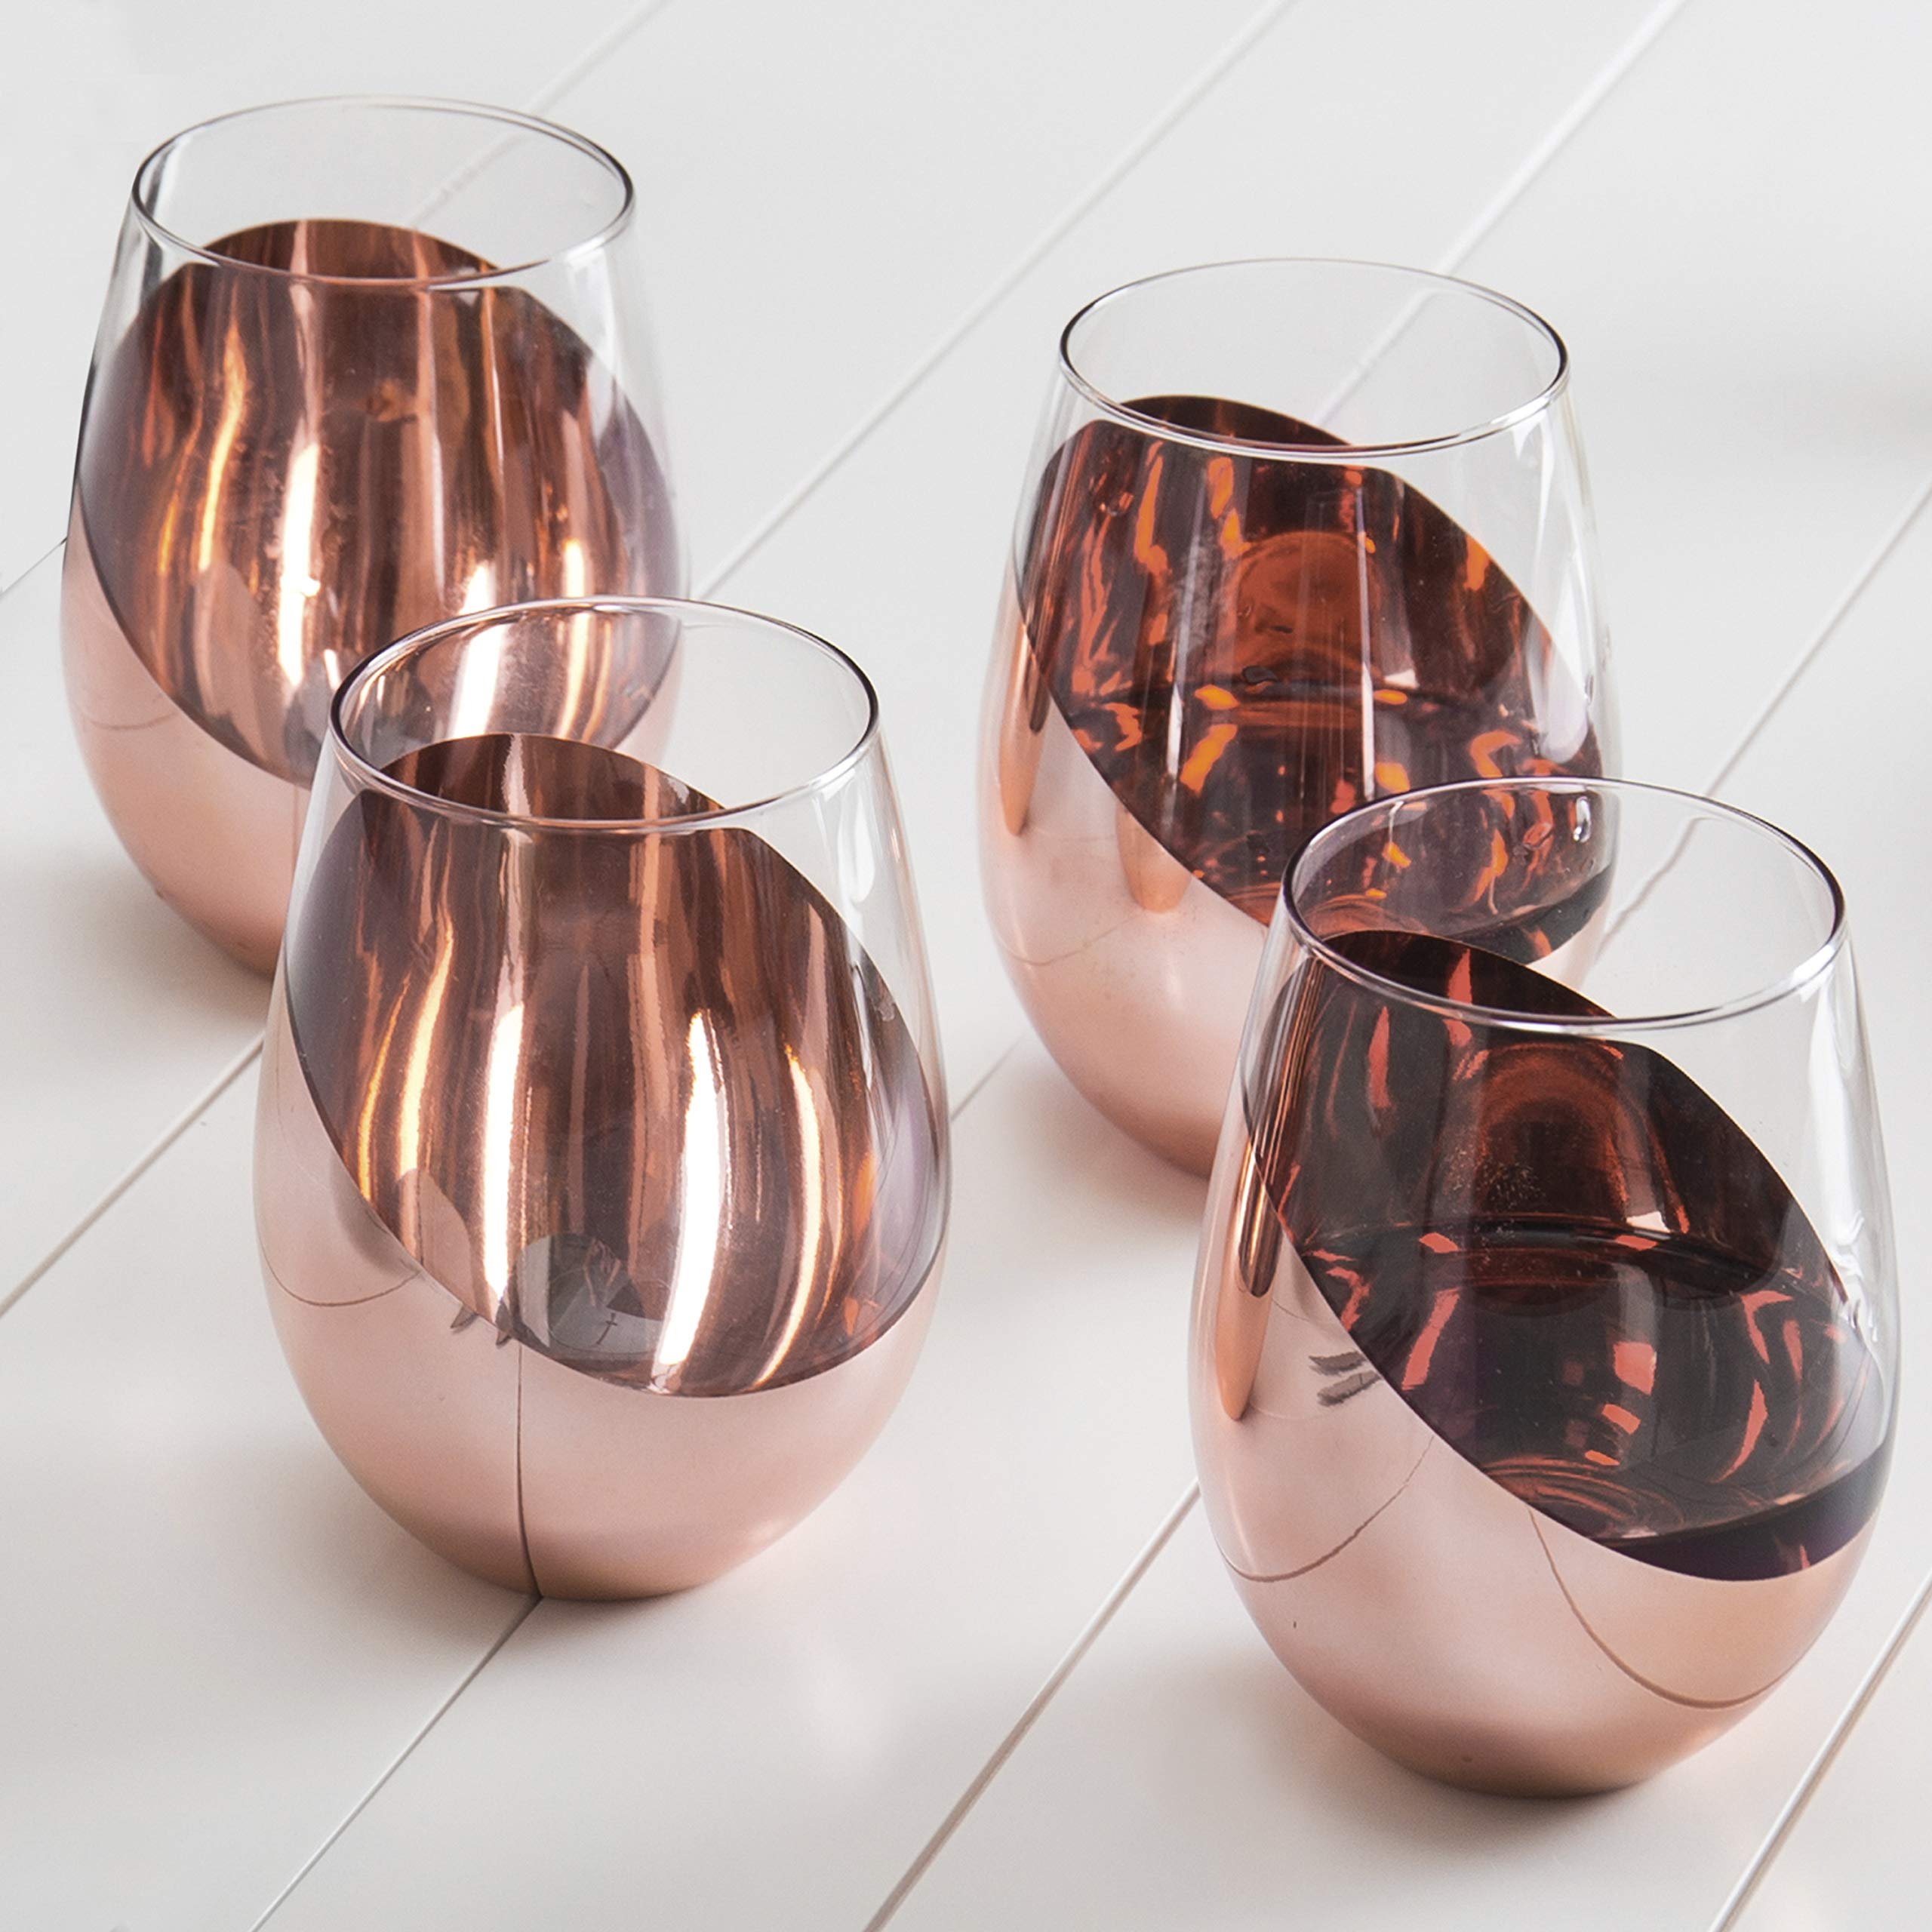 MyGift Modern Copper Stemless Wine Glasses, Set of 4 by MyGift